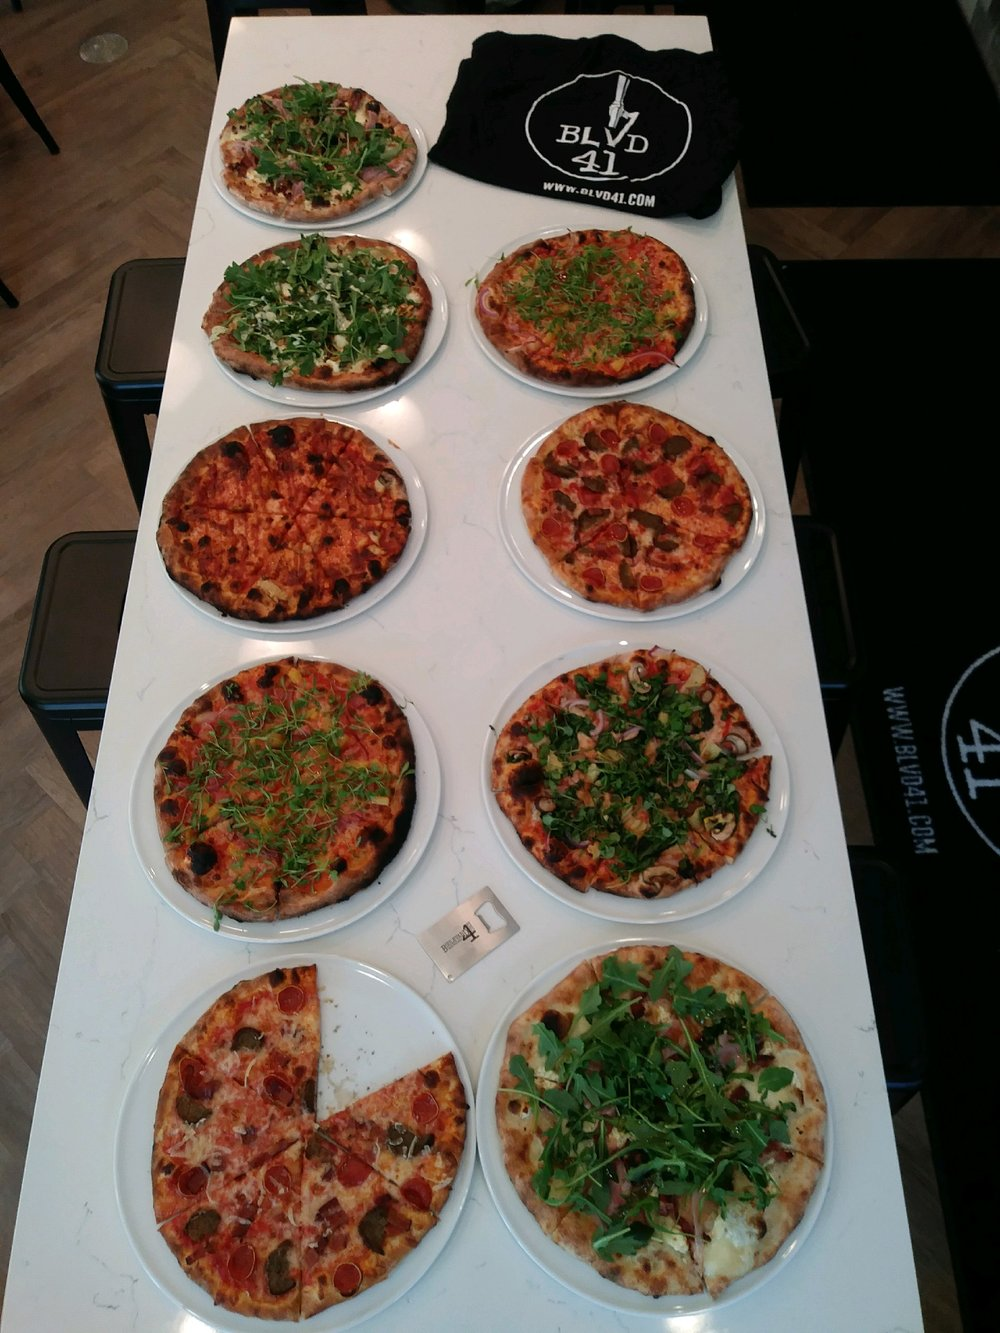 pizza geo - blvd 41 training.jpg